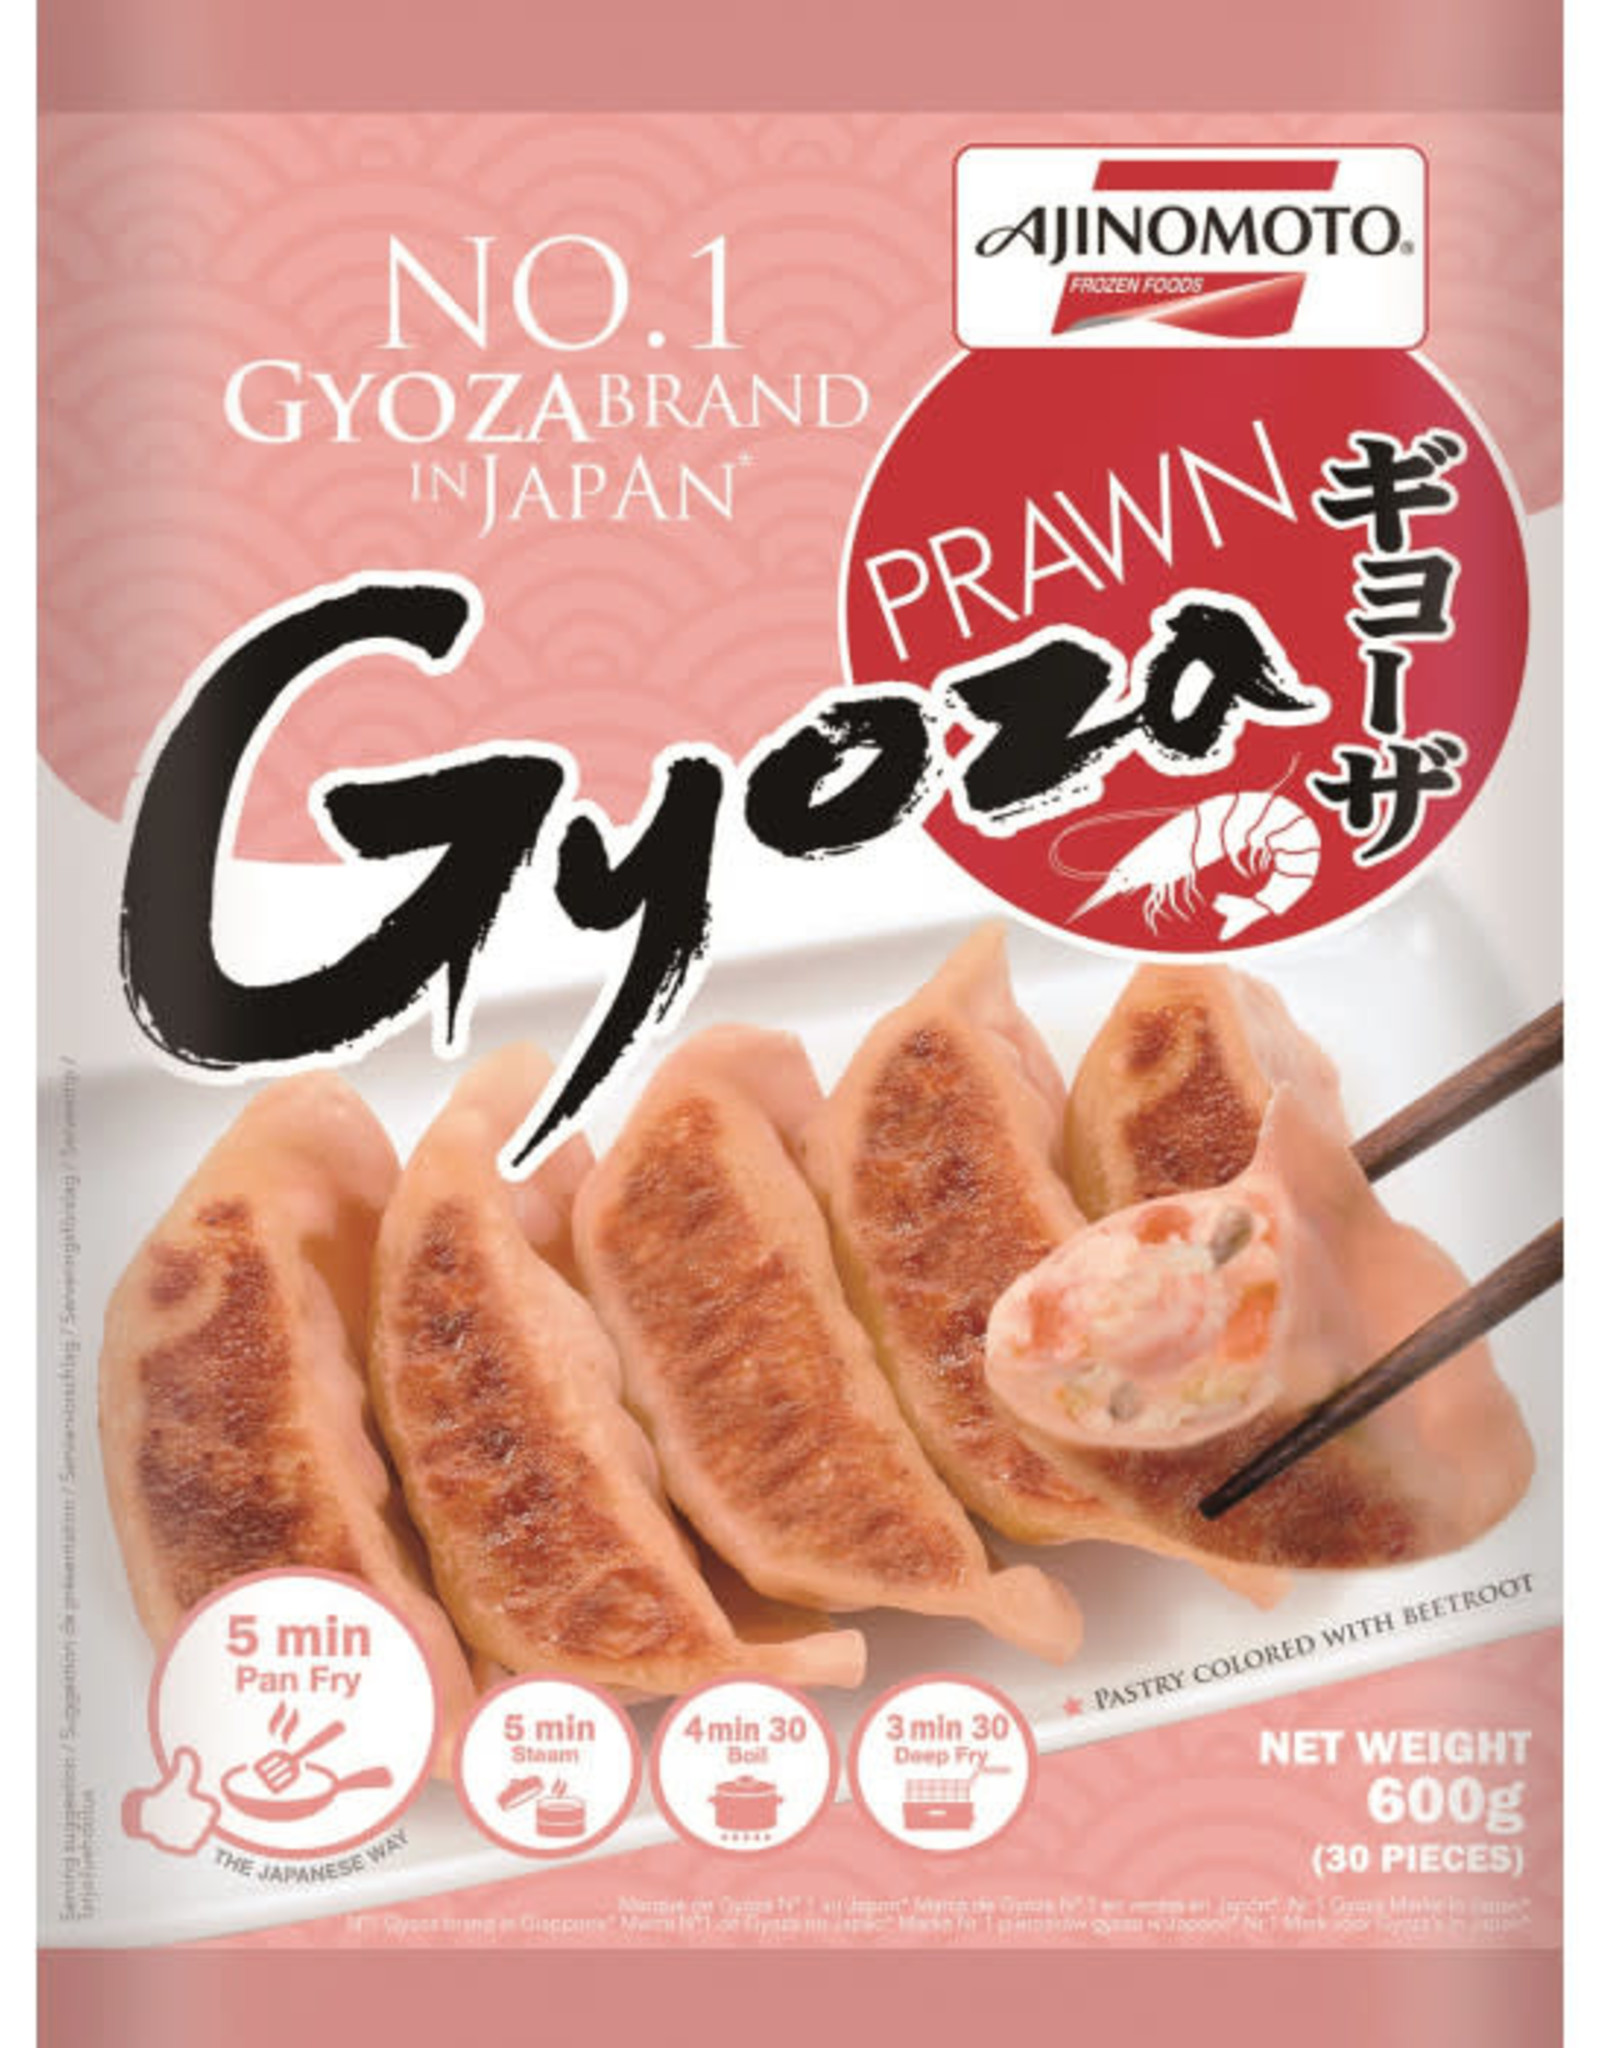 AJINOMOTO Japan Style Prawn Gyoza-18°C  600 Gr.  AJINOMOTO